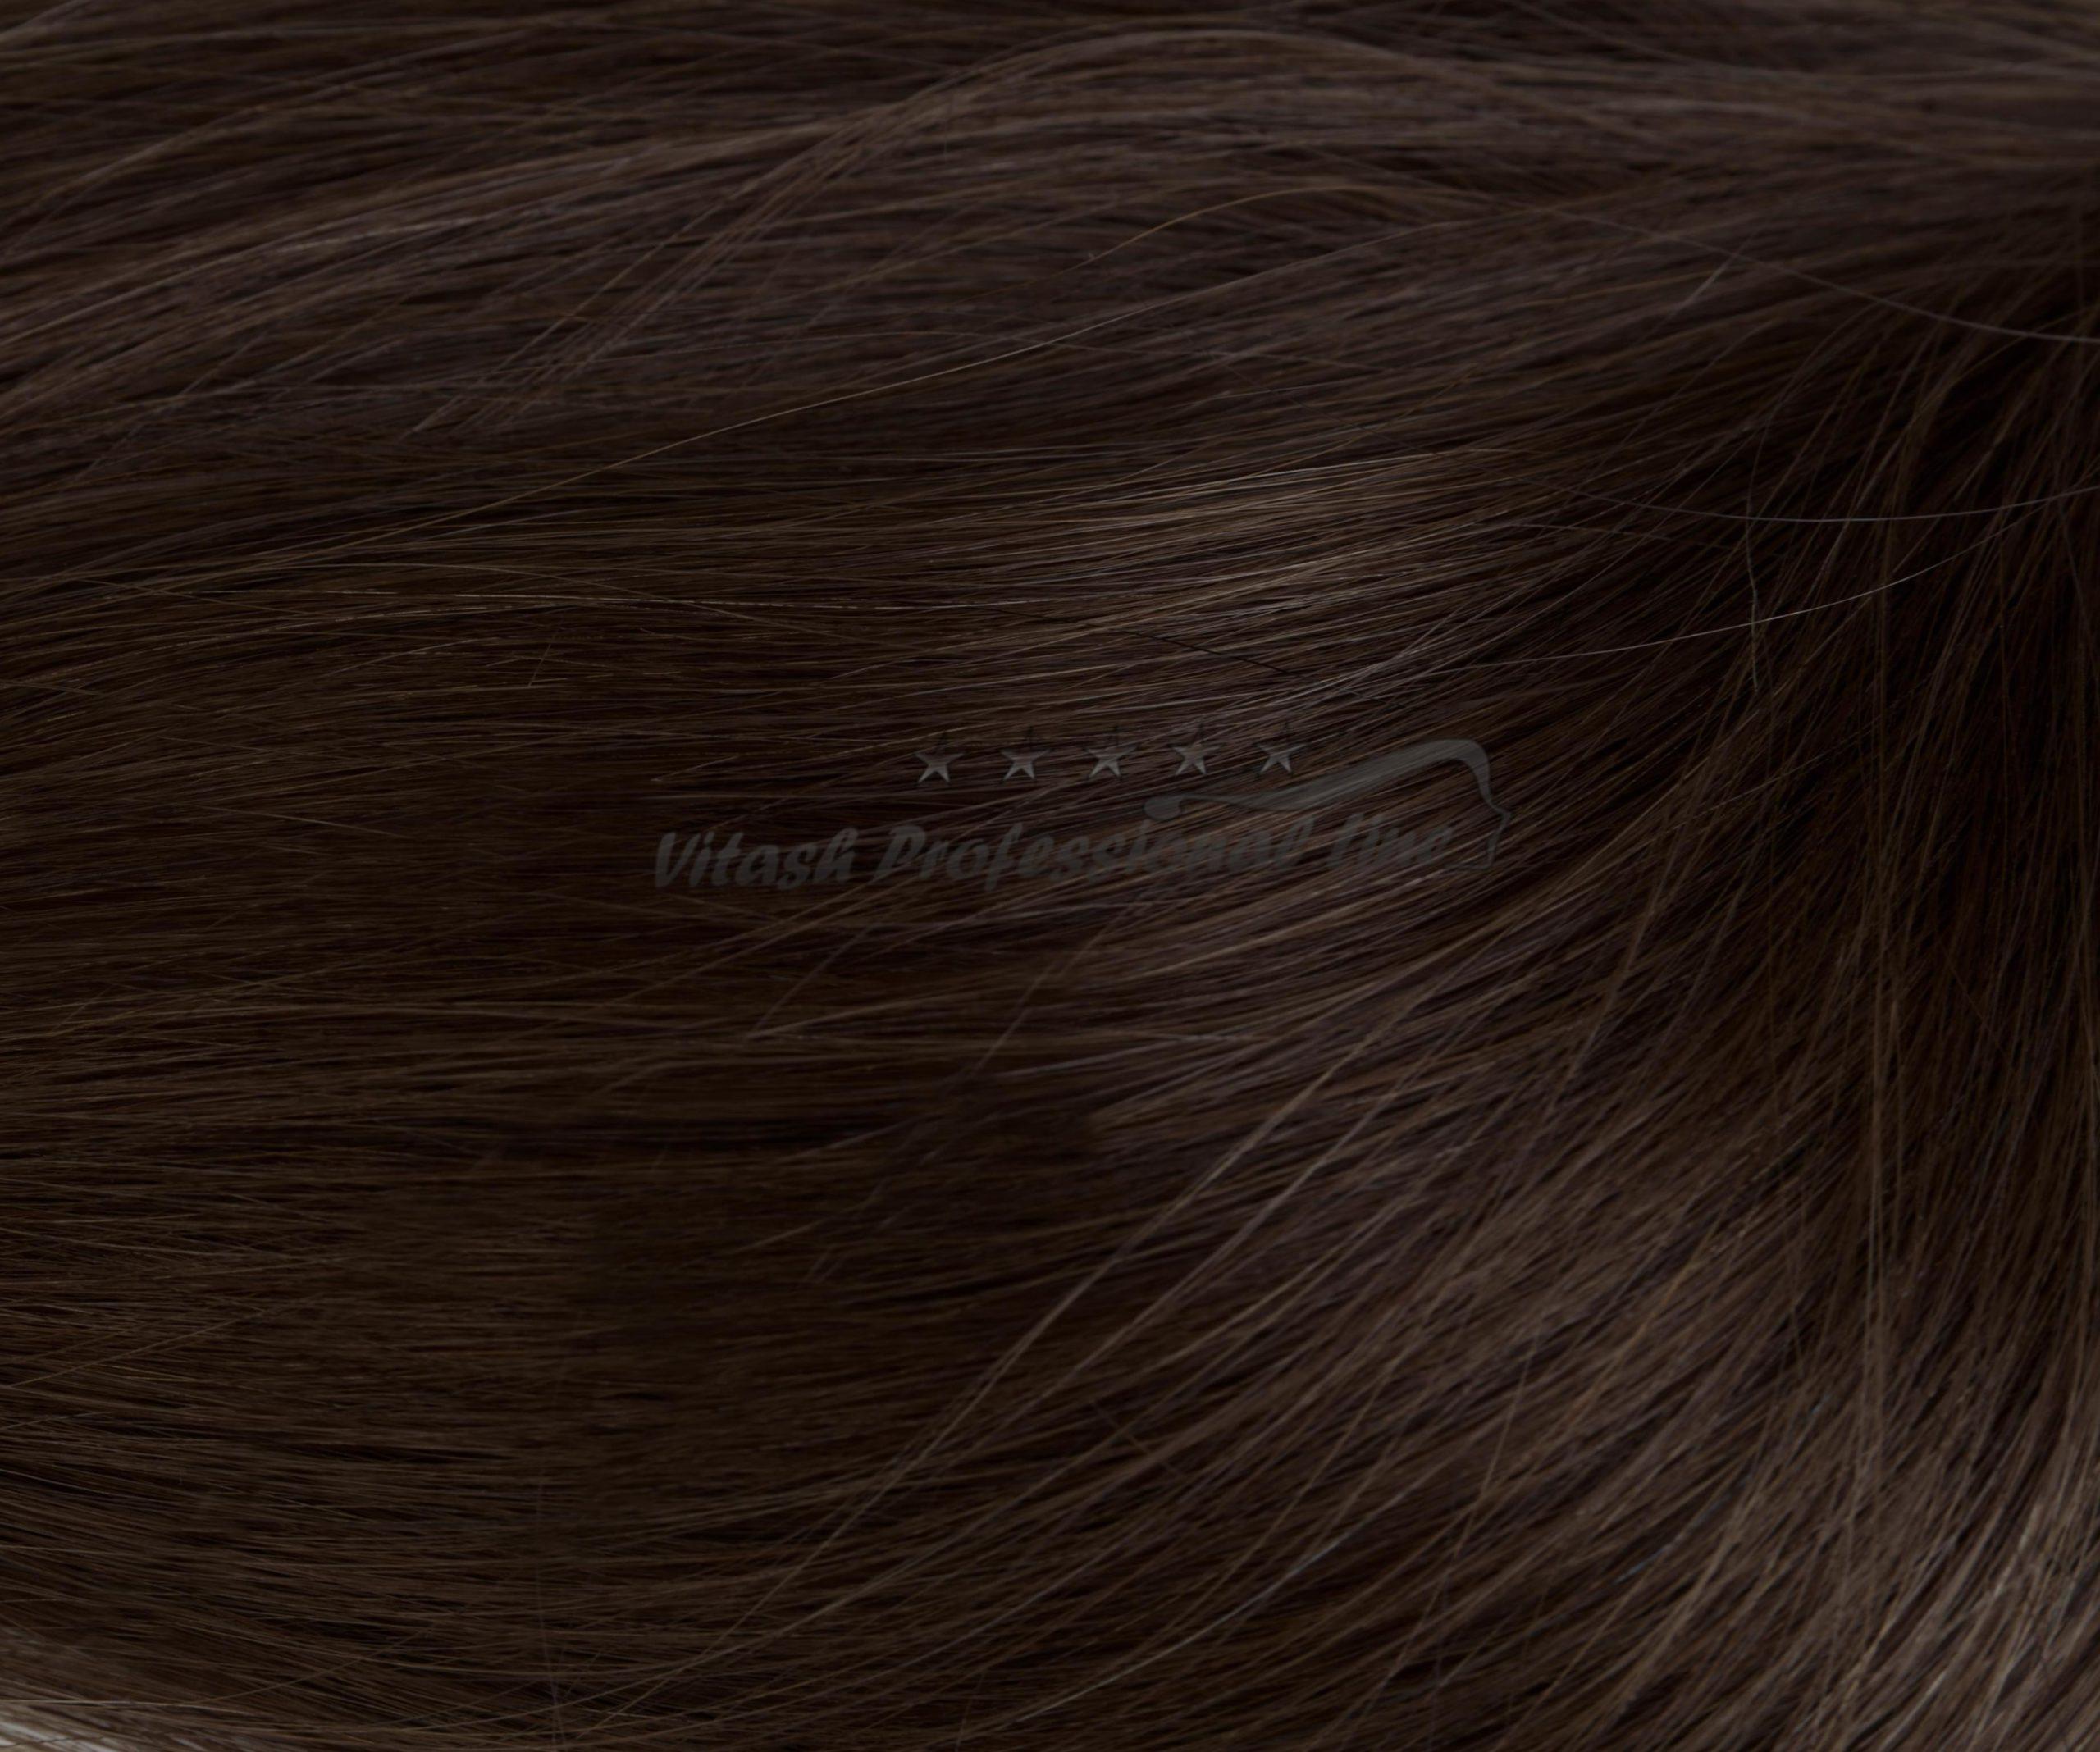 25 REMY indische Echthaar Strähnen - 0,8 Gramm pro Strähne #2- dunkelbraun